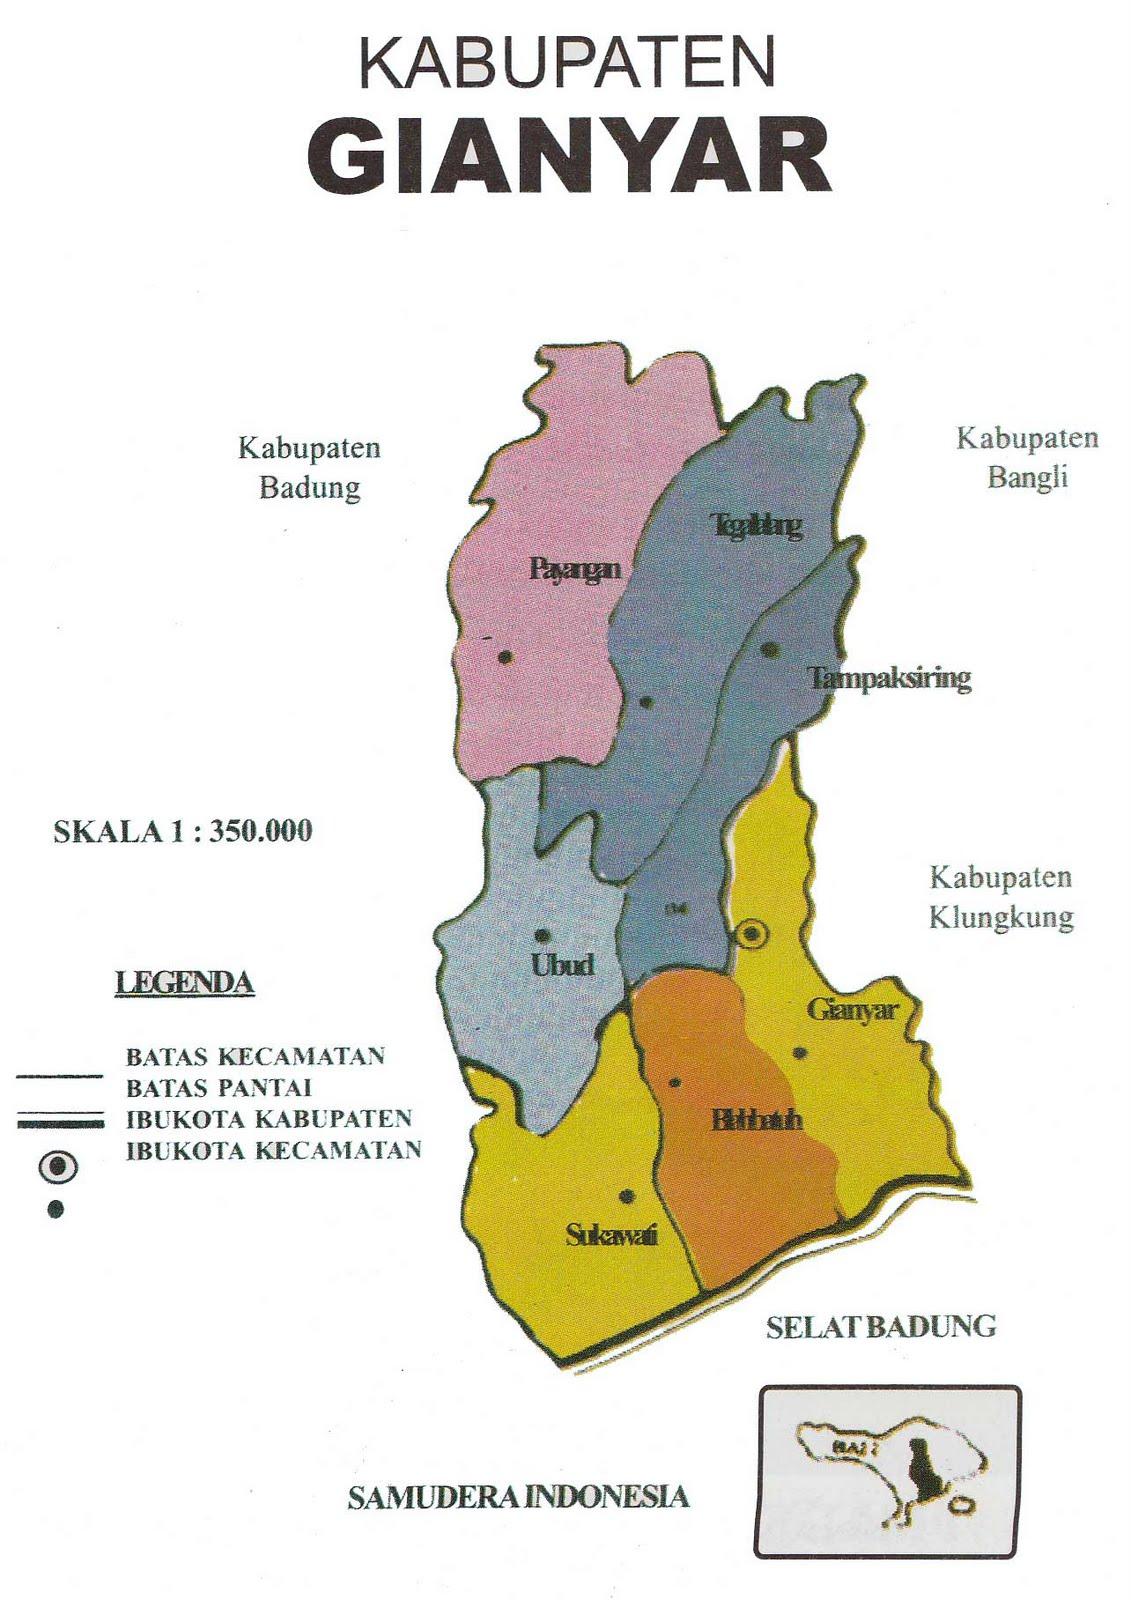 Sekilas Tentang Kabupaten Gianyar Bali Peta Taman Nusa Kab